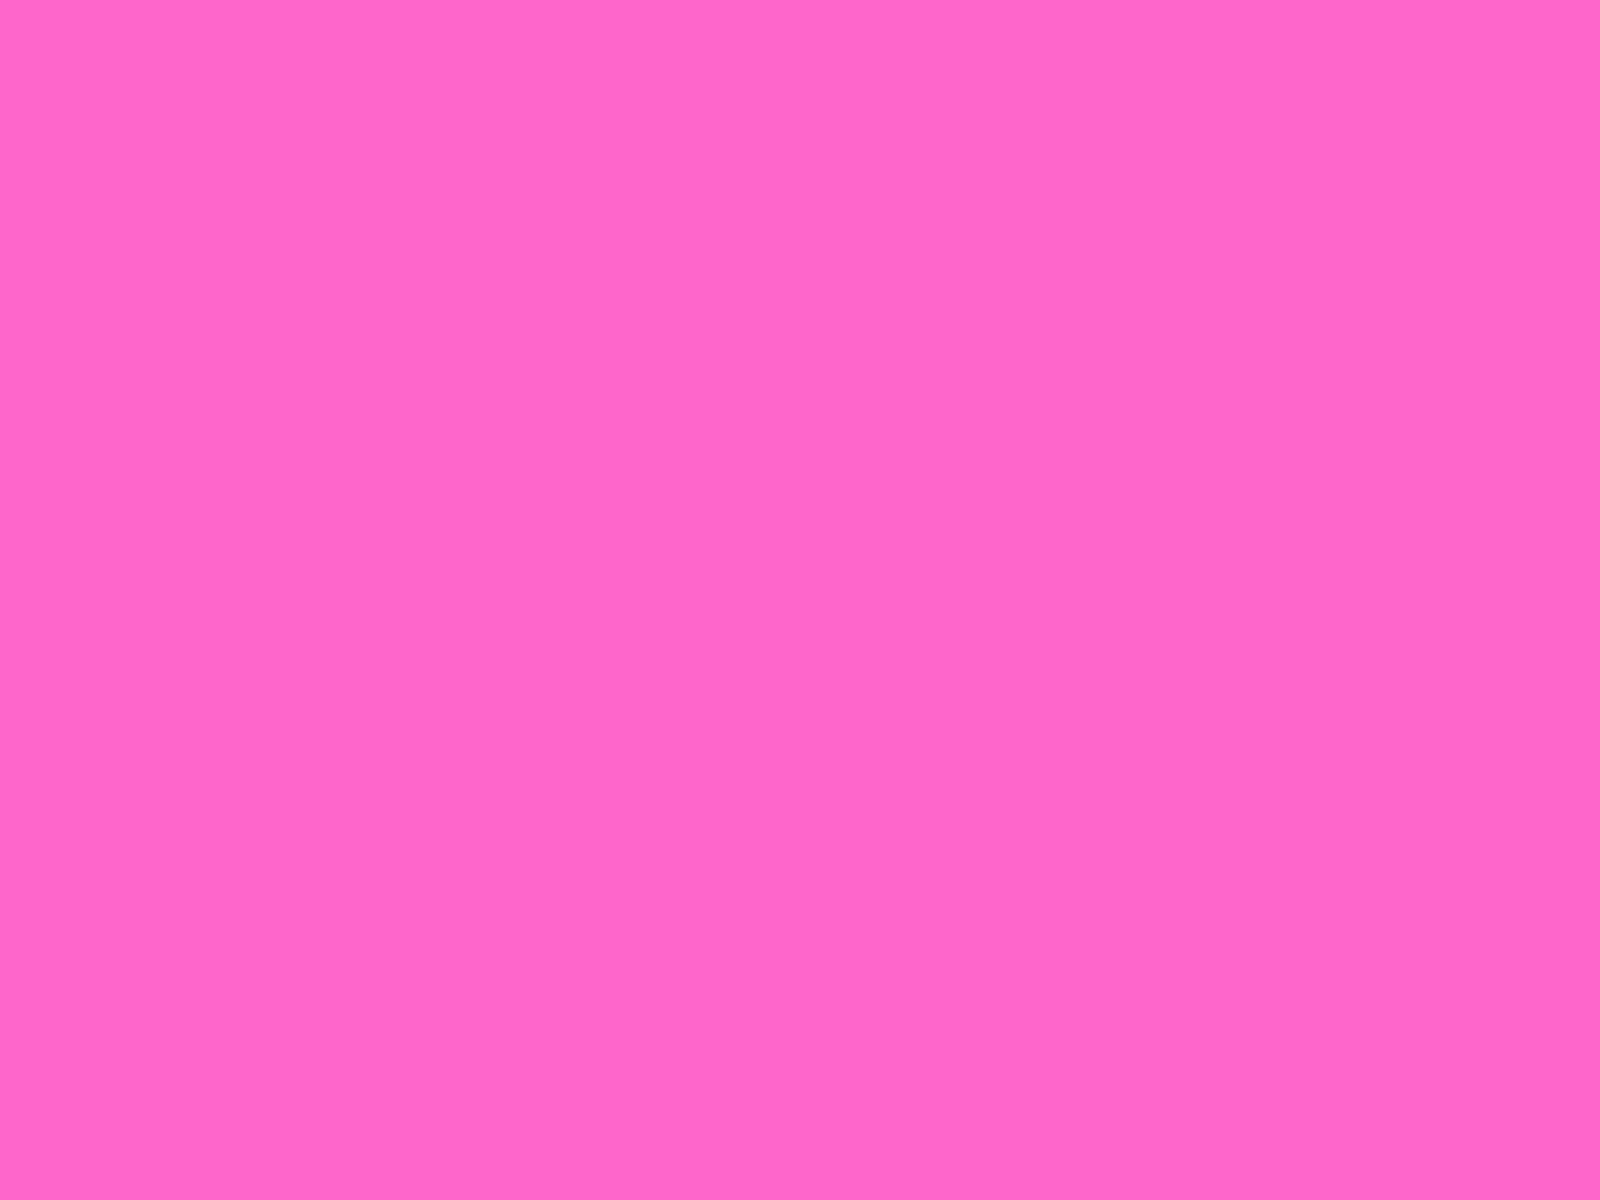 1600x1200 Rose Pink Solid Color Background